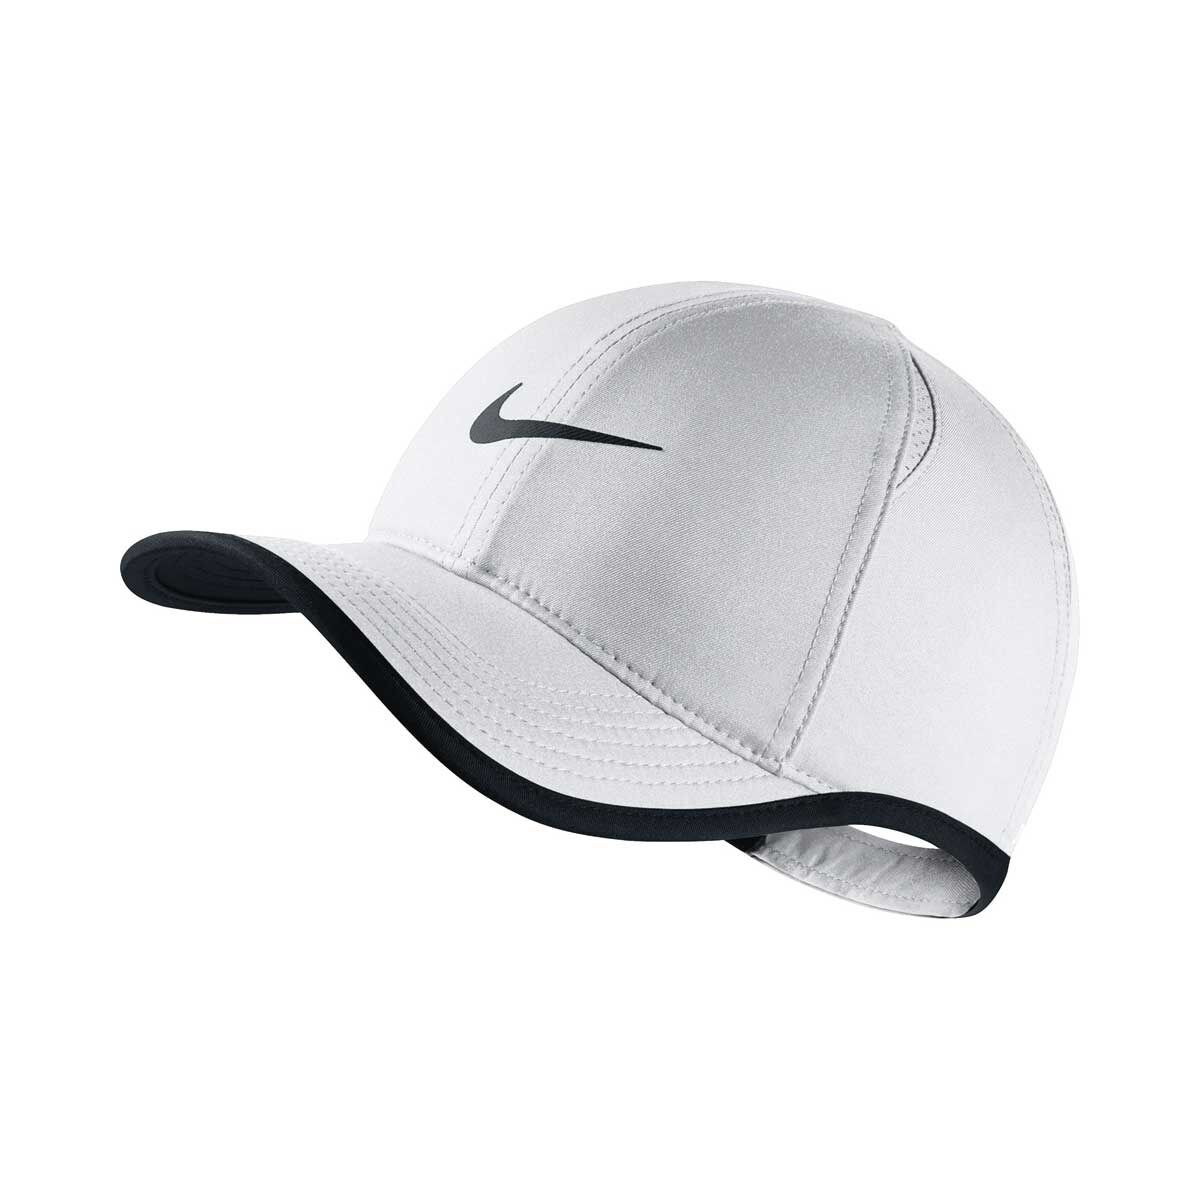 78fe68d4 ... best price nike girls featherlight cap white black osfa rebelhi res  ad51e 94483